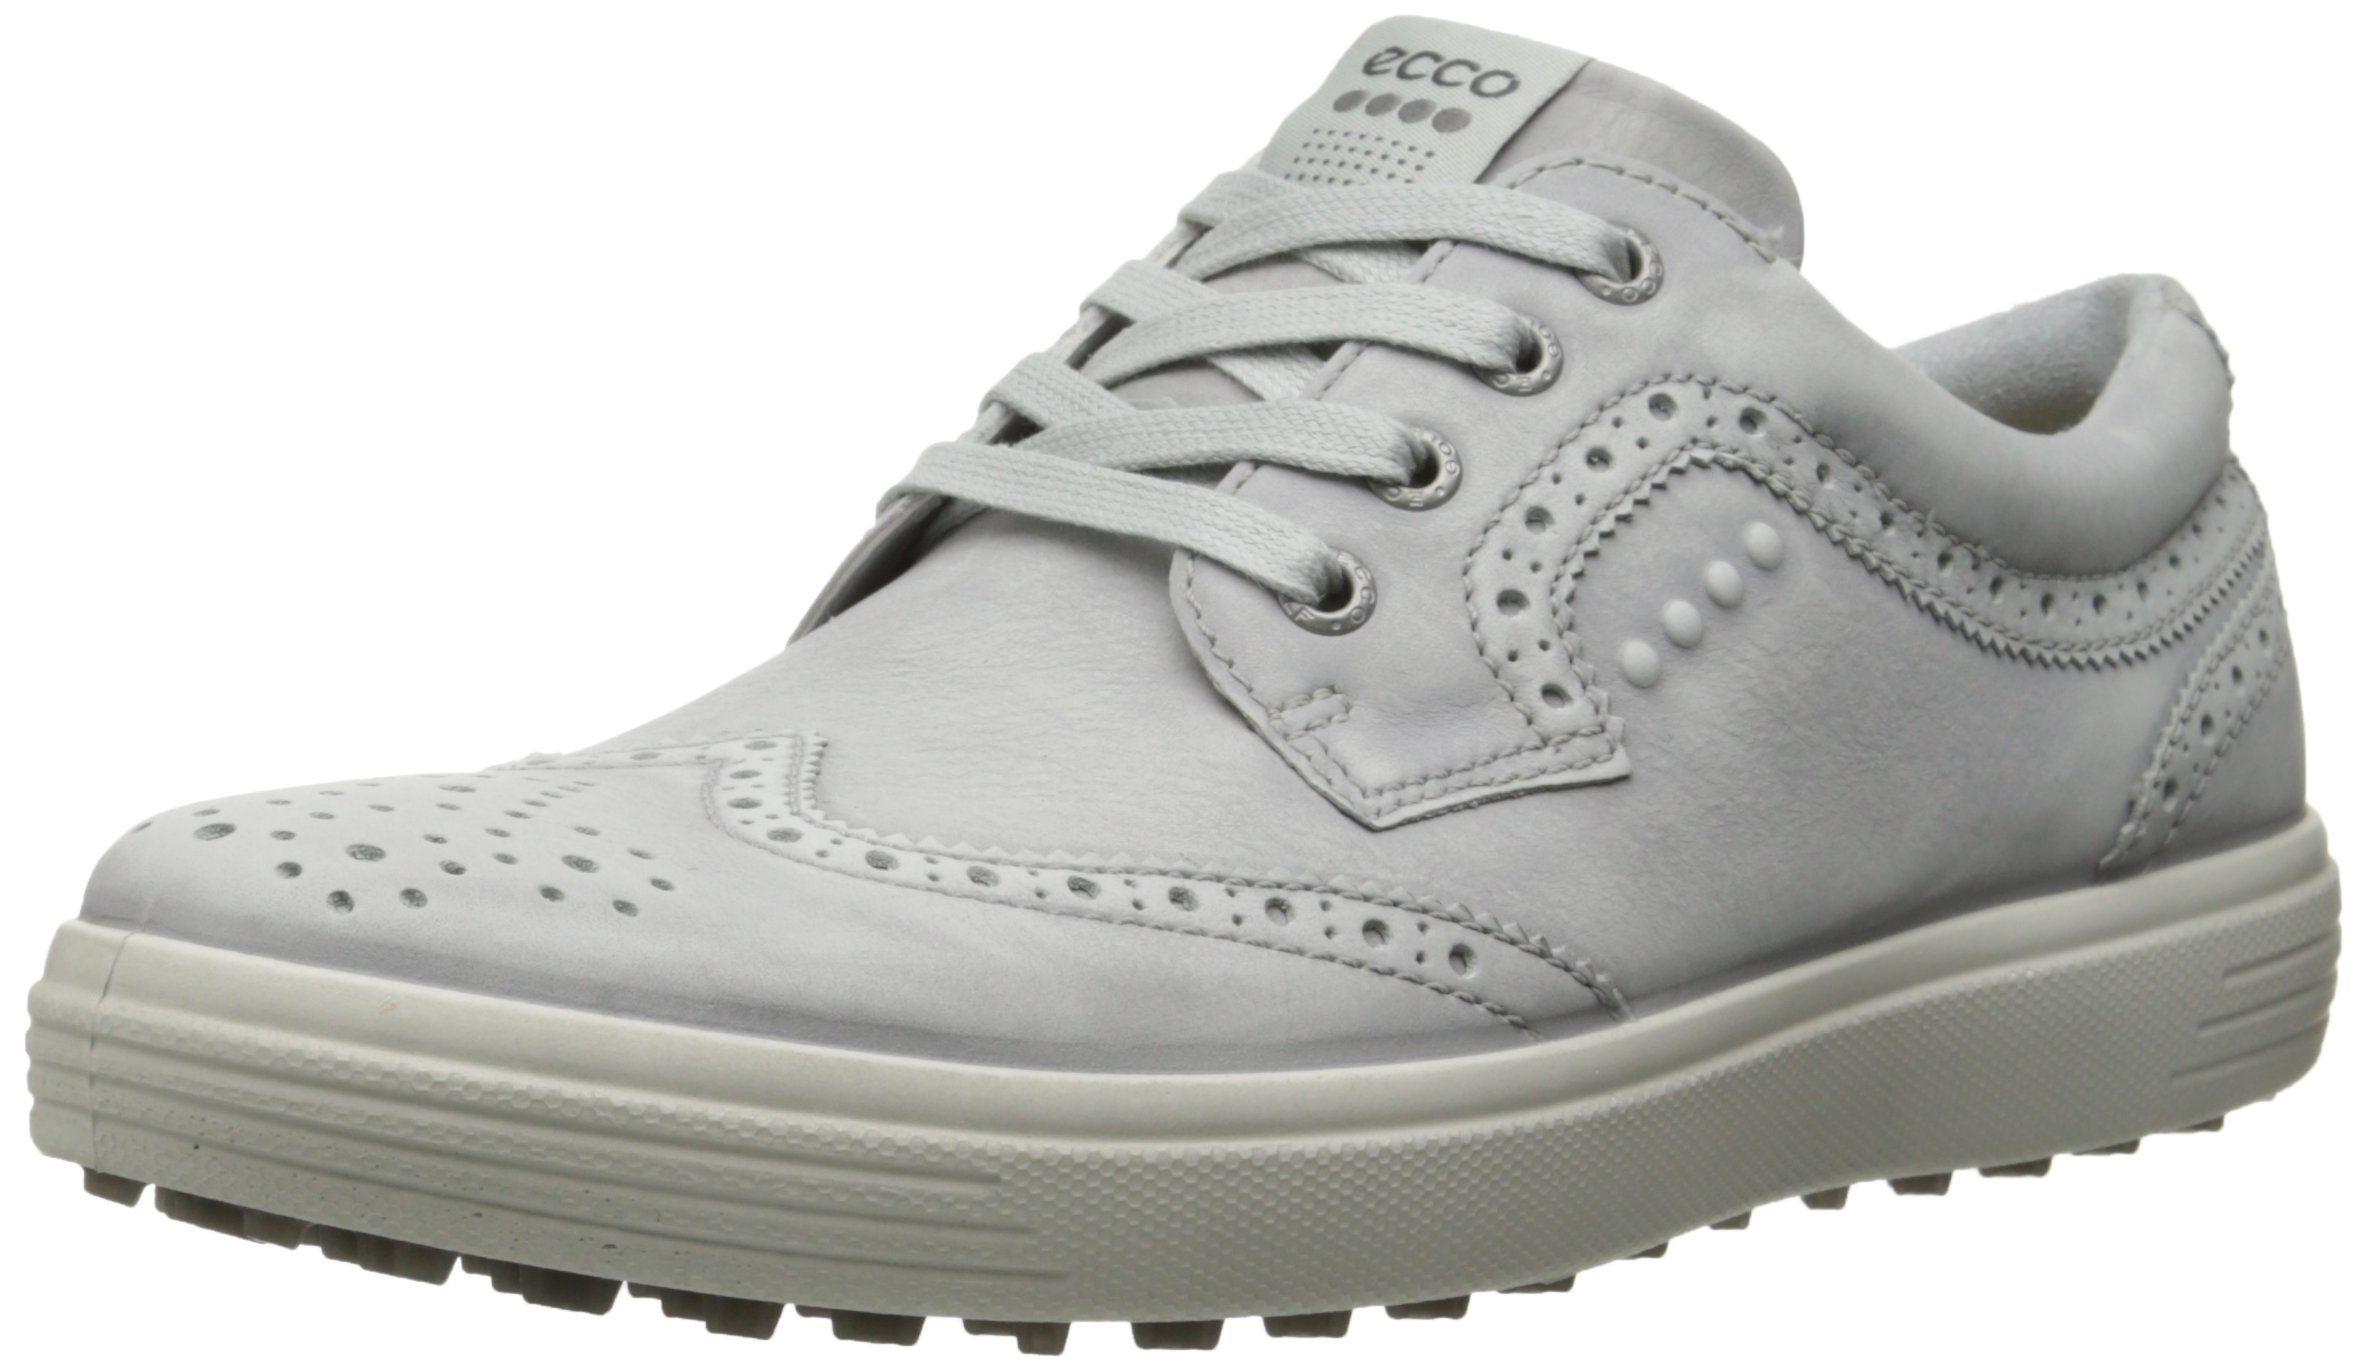 Golf Shoes *** ECCO Mens Casual Hybrid